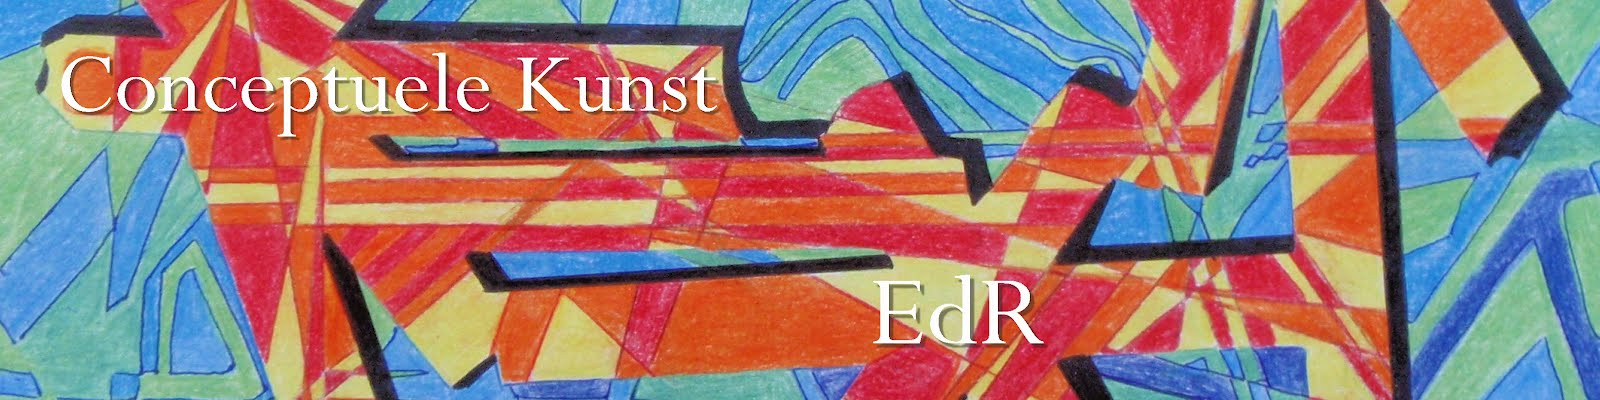 Conceptuele Kunst EdR